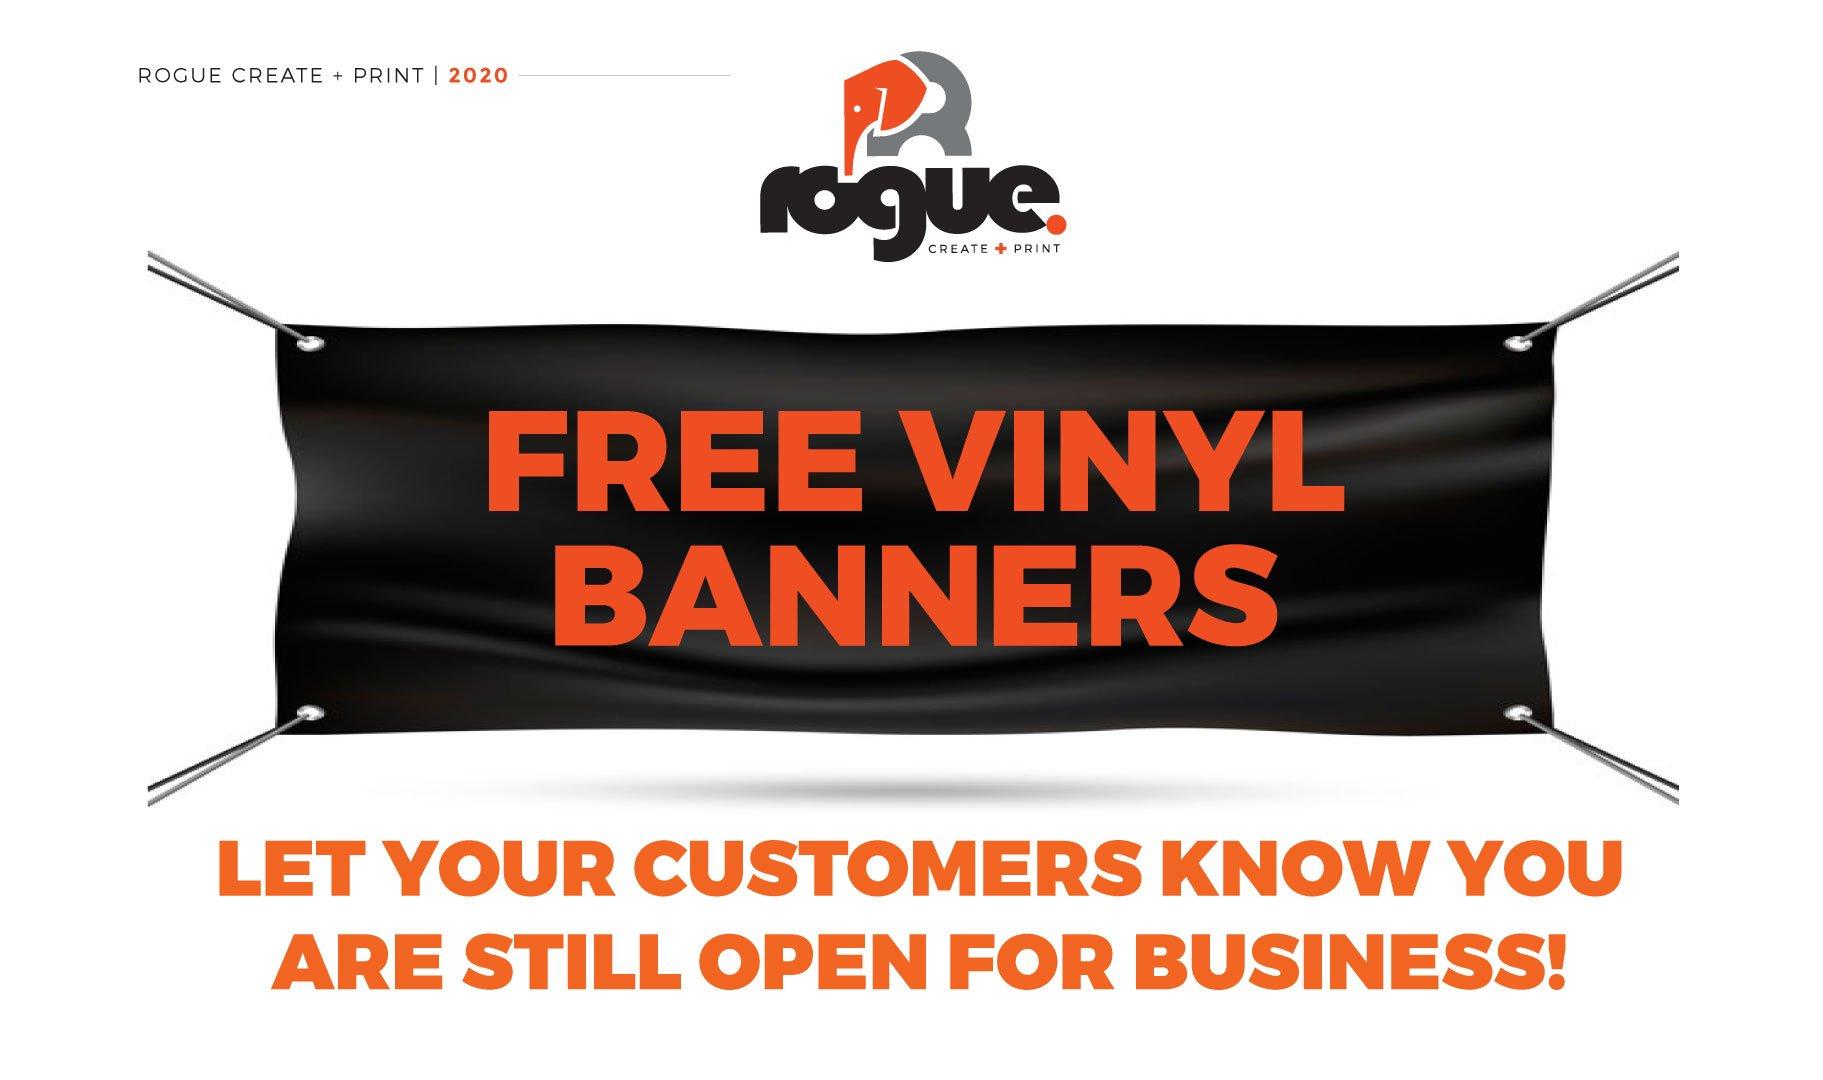 Free Vinyl Banner Offer Web Image